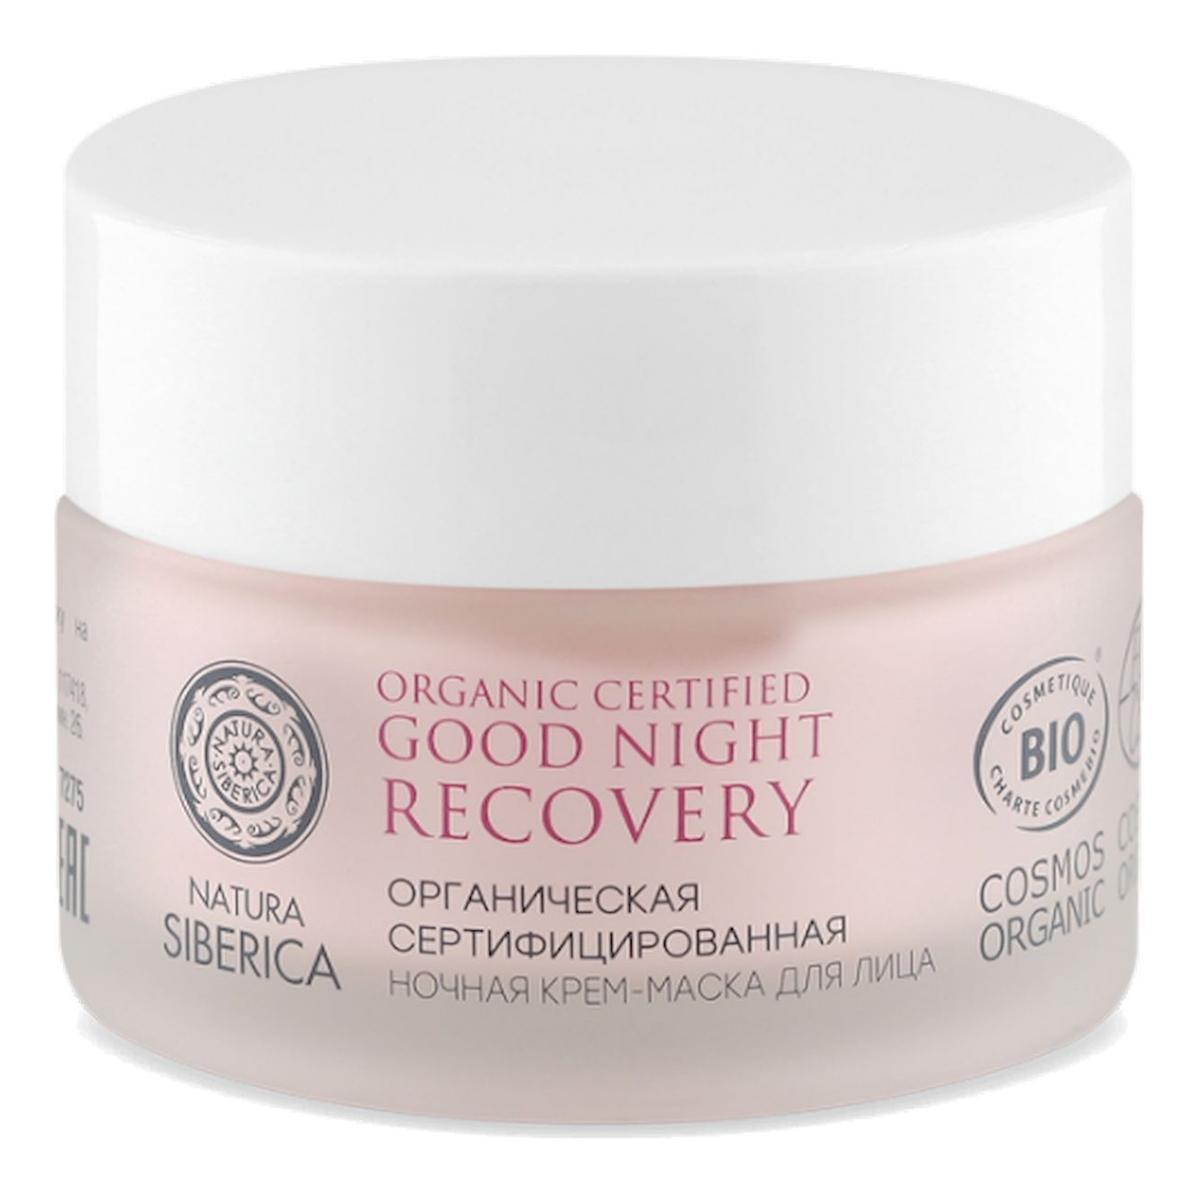 Купить Ночная крем-маска для лица Good Night Recovery Anti-Age 50мл, Natura Siberica